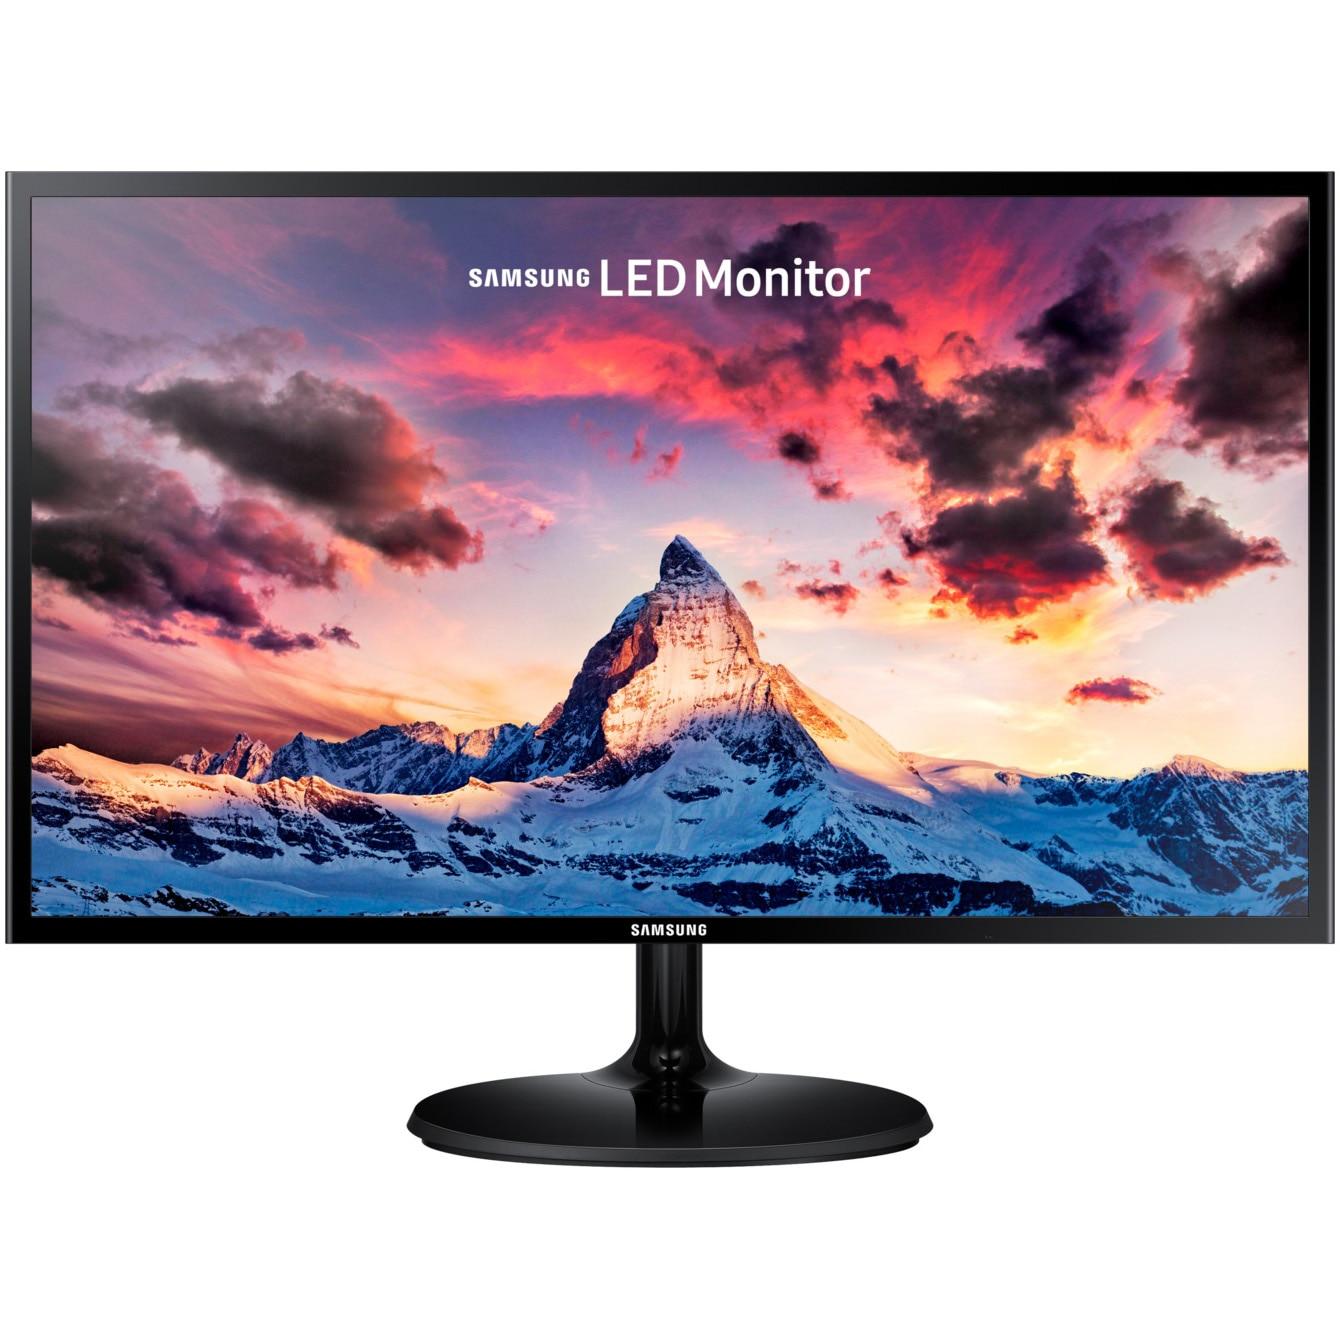 "Fotografie Monitor Gaming LED PLS Samsung 23.5"", Full HD, HDMI, FreeSync, Game Mode, Flicker Free, Slim, Negru, LS24F354FHU"